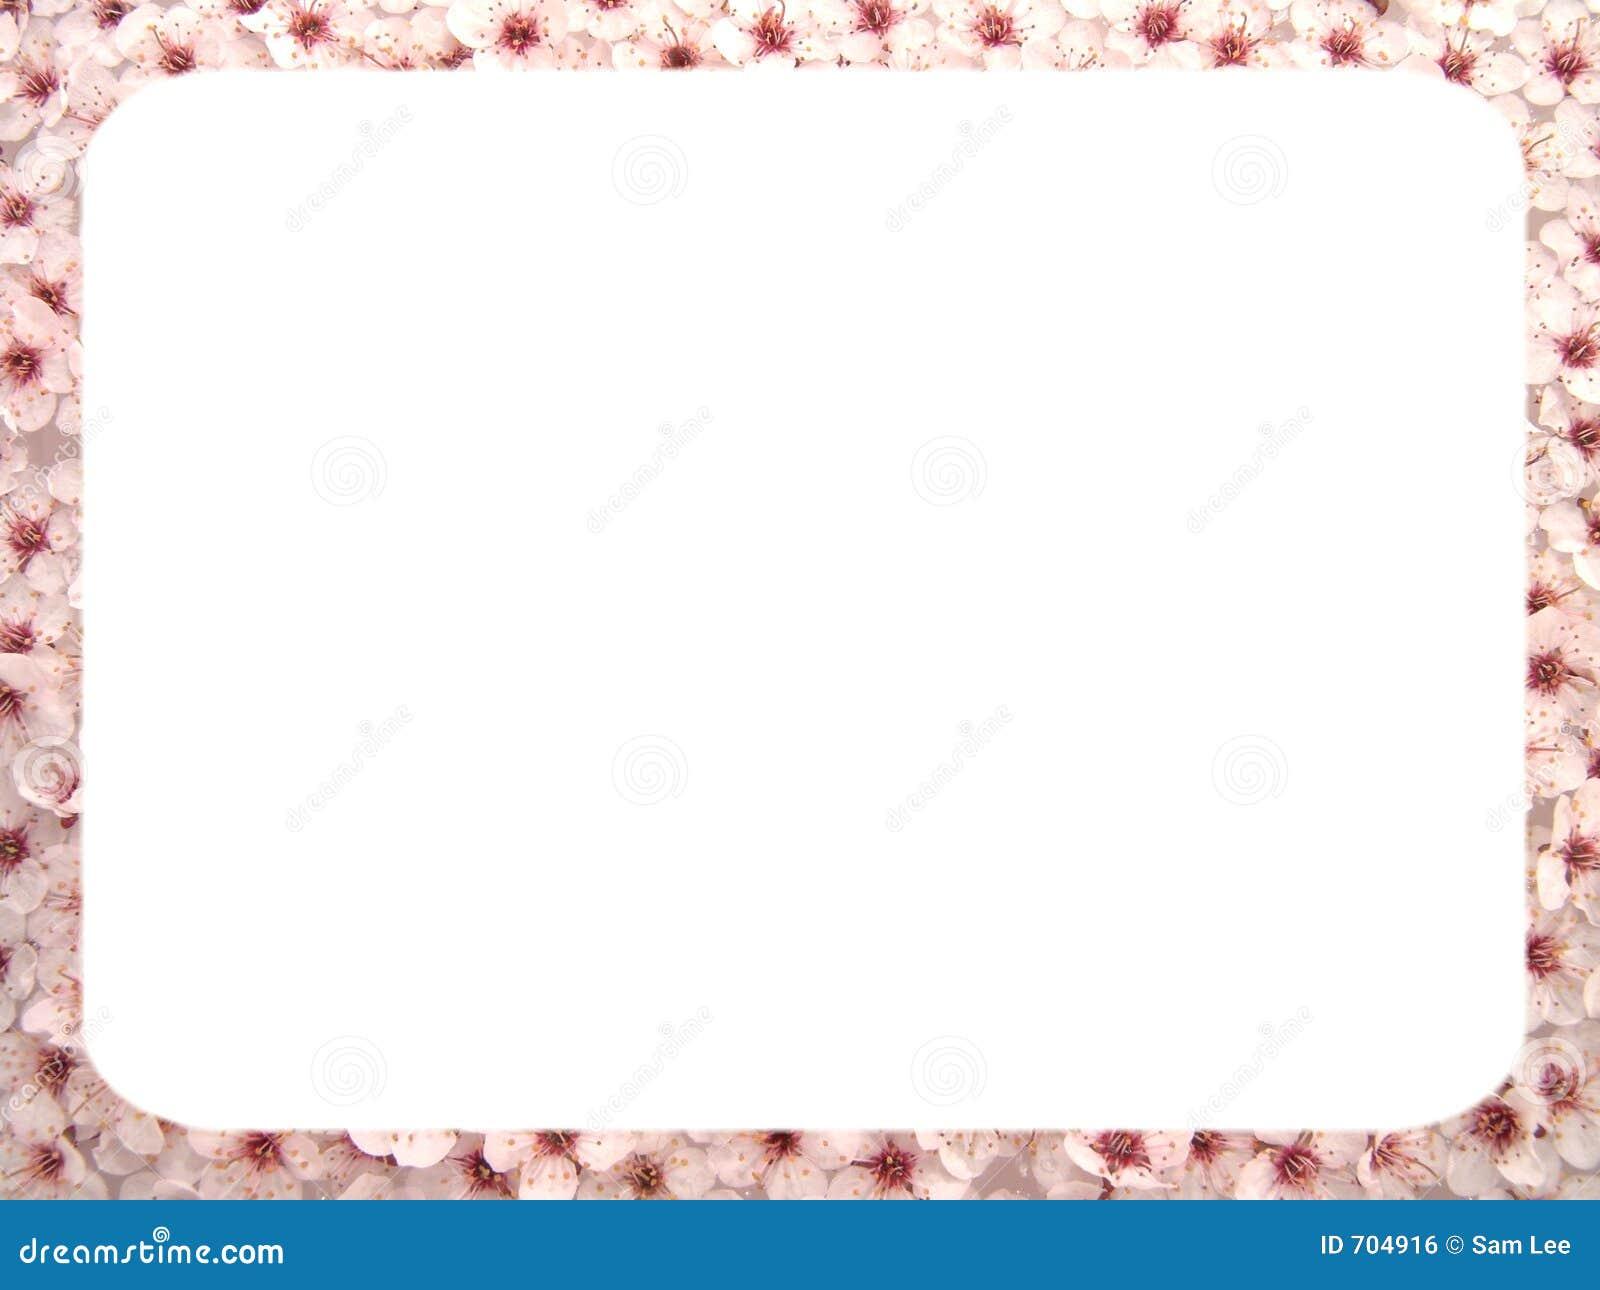 Plum Flowers Frame I stock photo. Image of kindness, heart - 704916